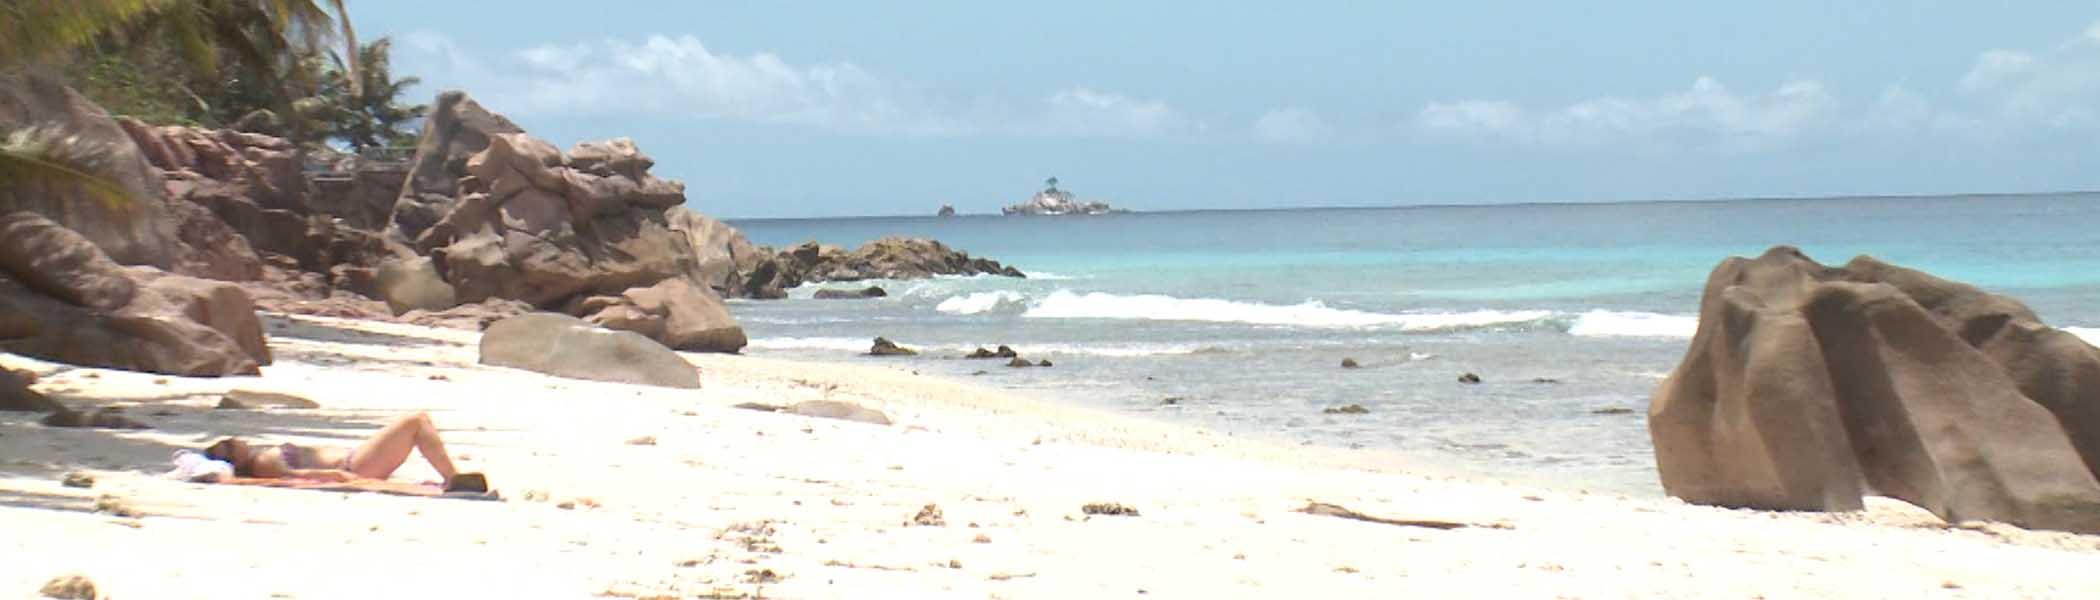 anse-gaulettes, Beaches in Seychelles Islands